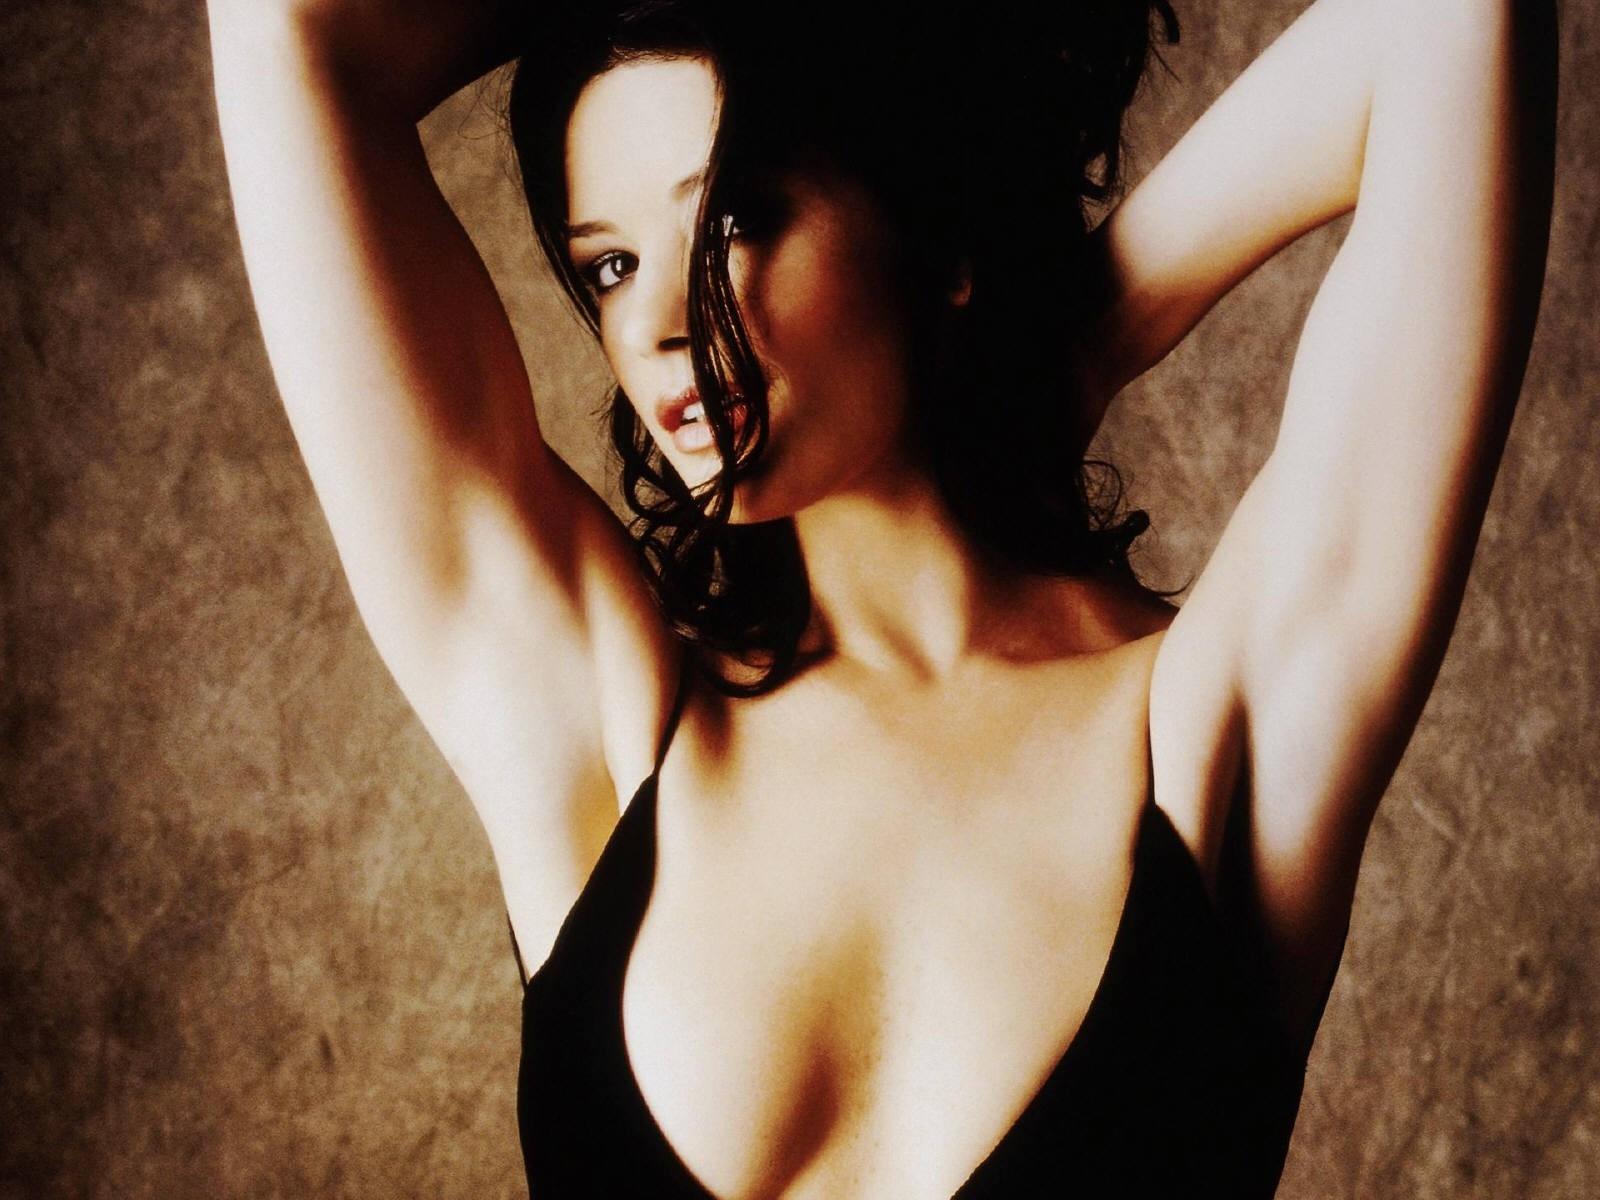 Wallpaper di Catherine Zeta-Jones - 26